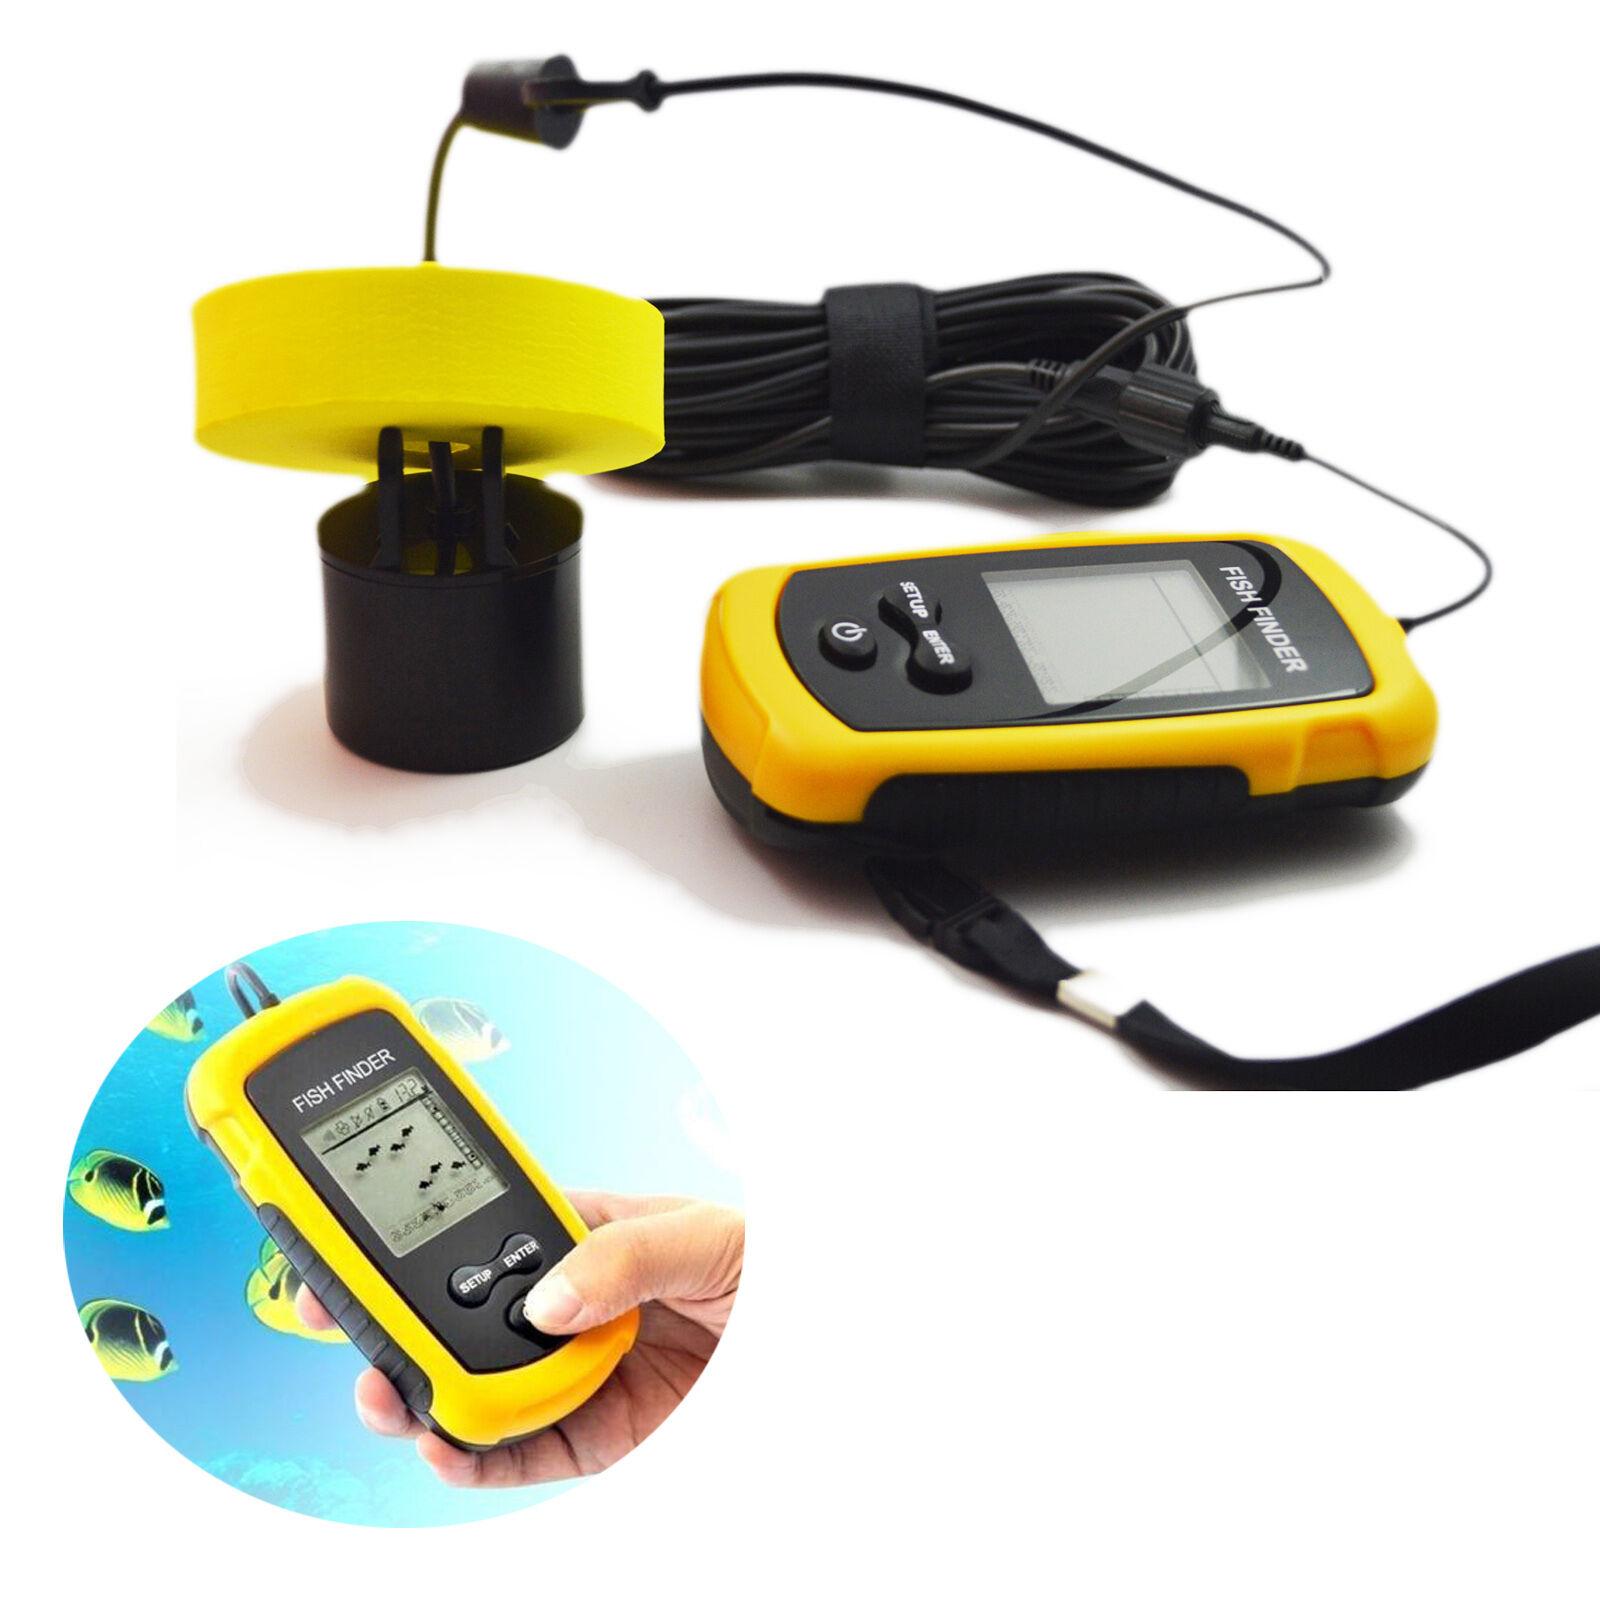 LCD Portable Boat Fish Finder Outdoor Fishing Tool Sonar Sensor 100m Depth